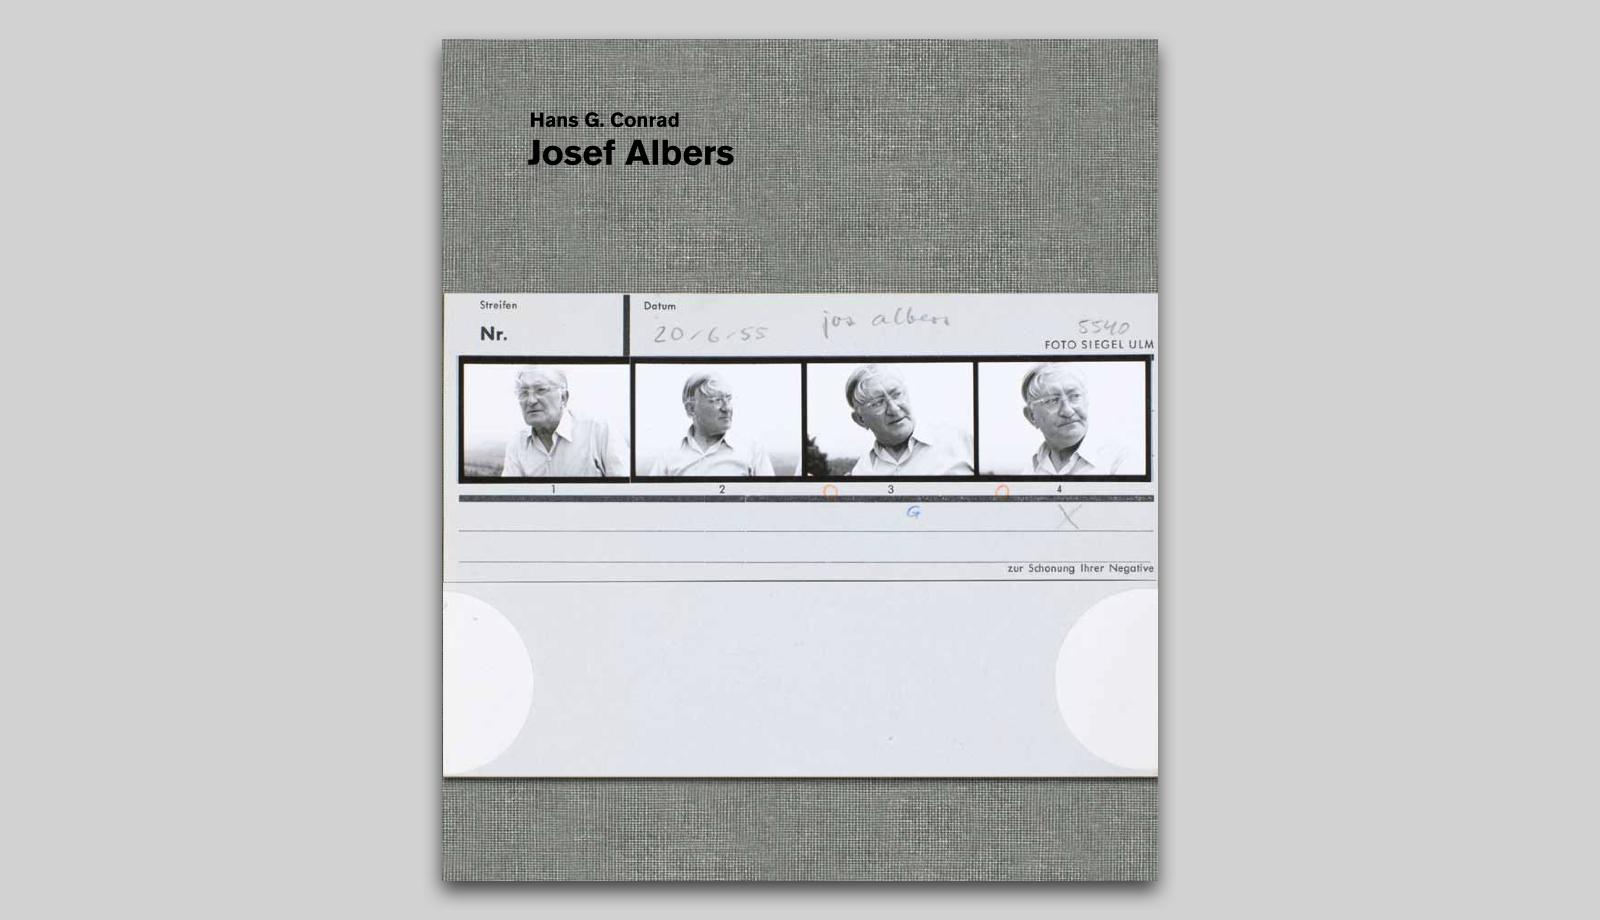 180601_ReneSpitz_HansGConrad_Edition 1_Josef Albers